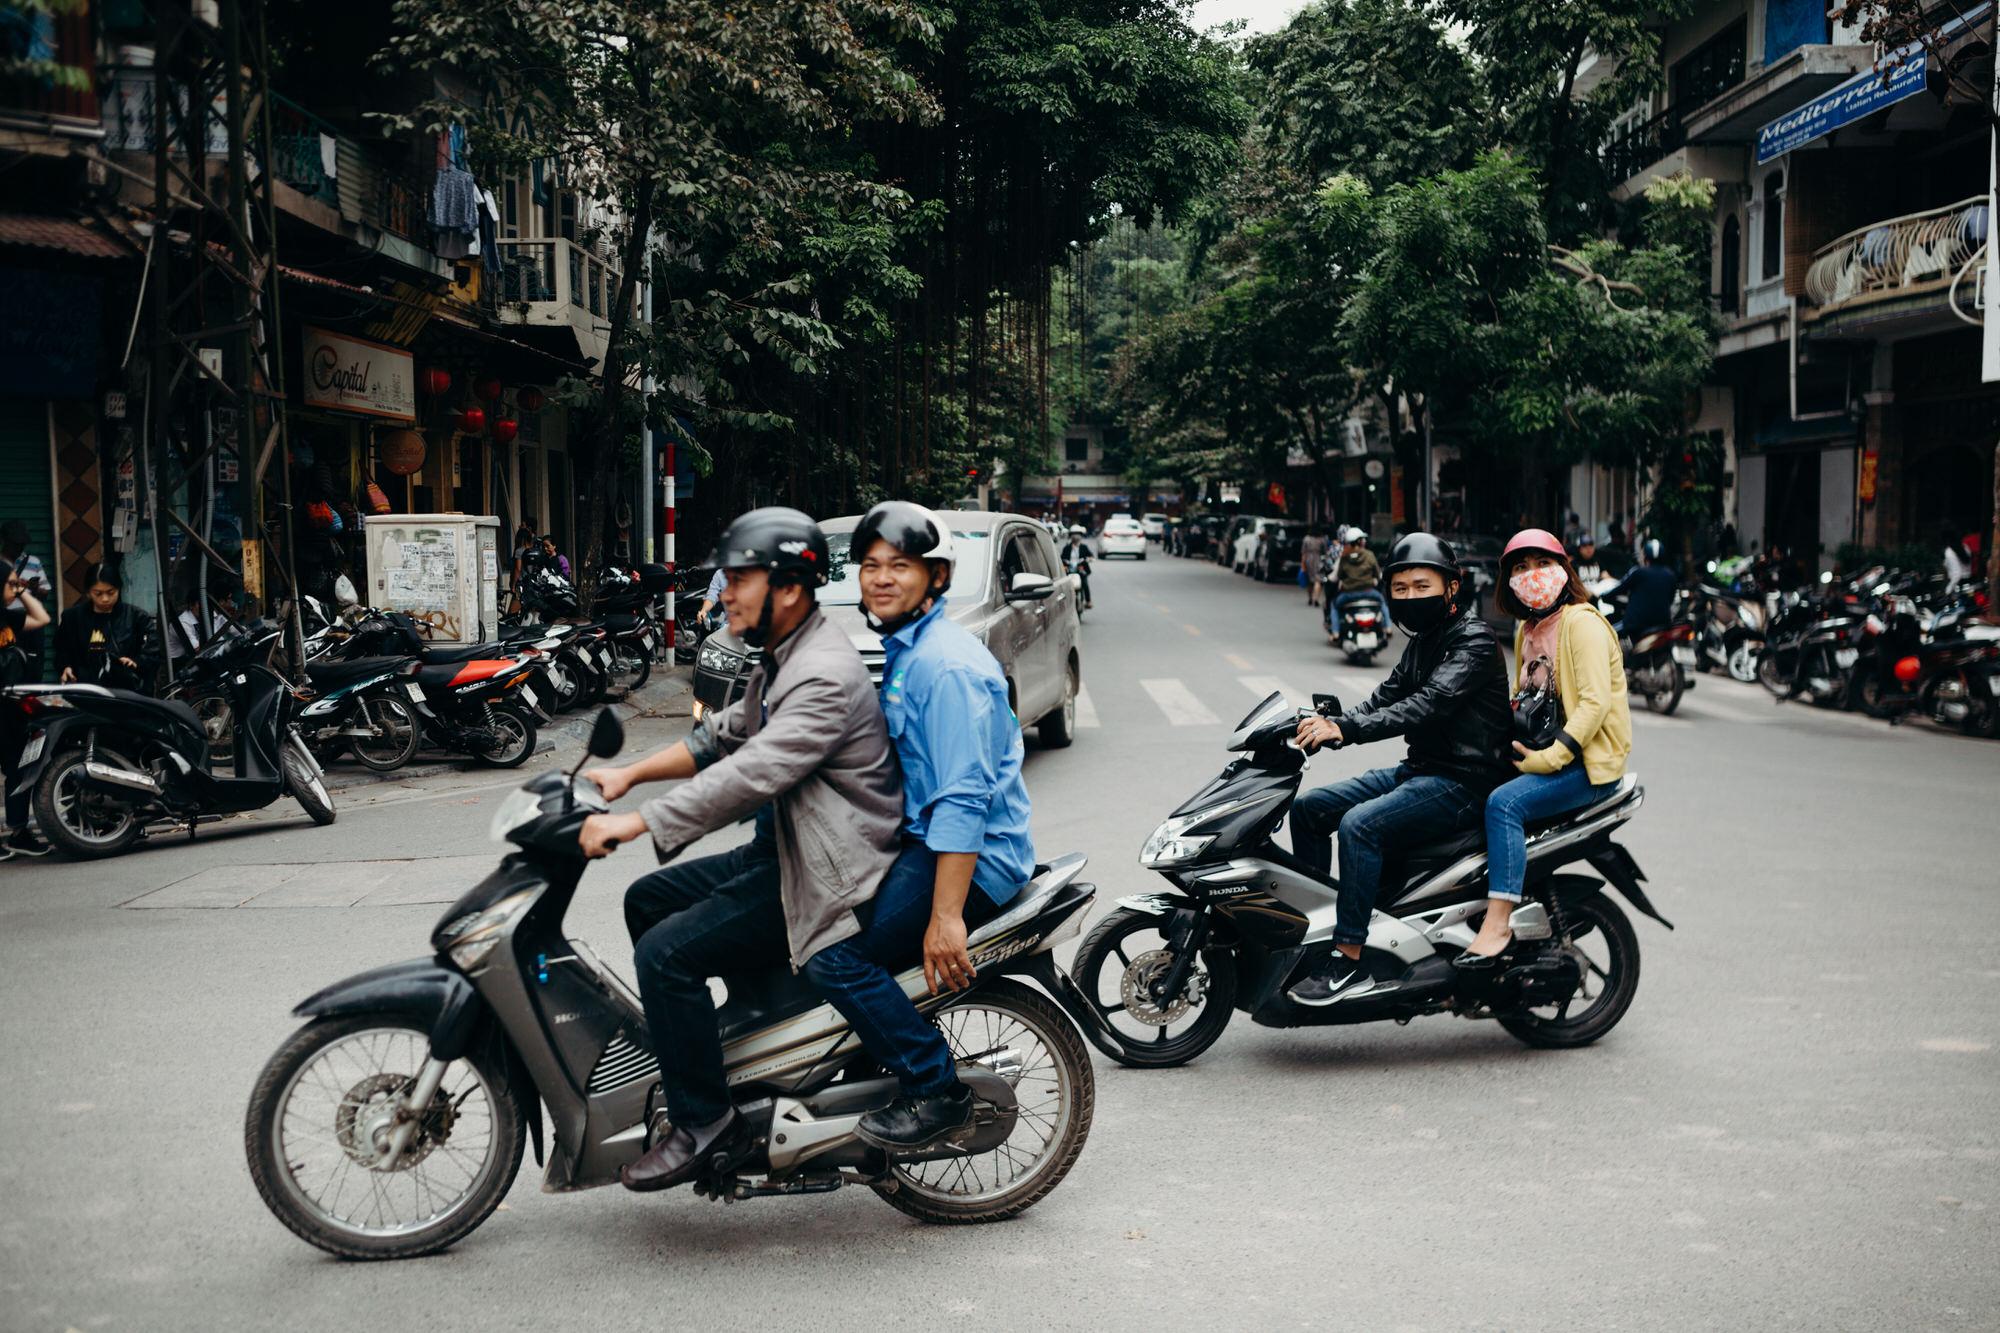 hanoivietnamcitytravelblog-9719-1.jpg